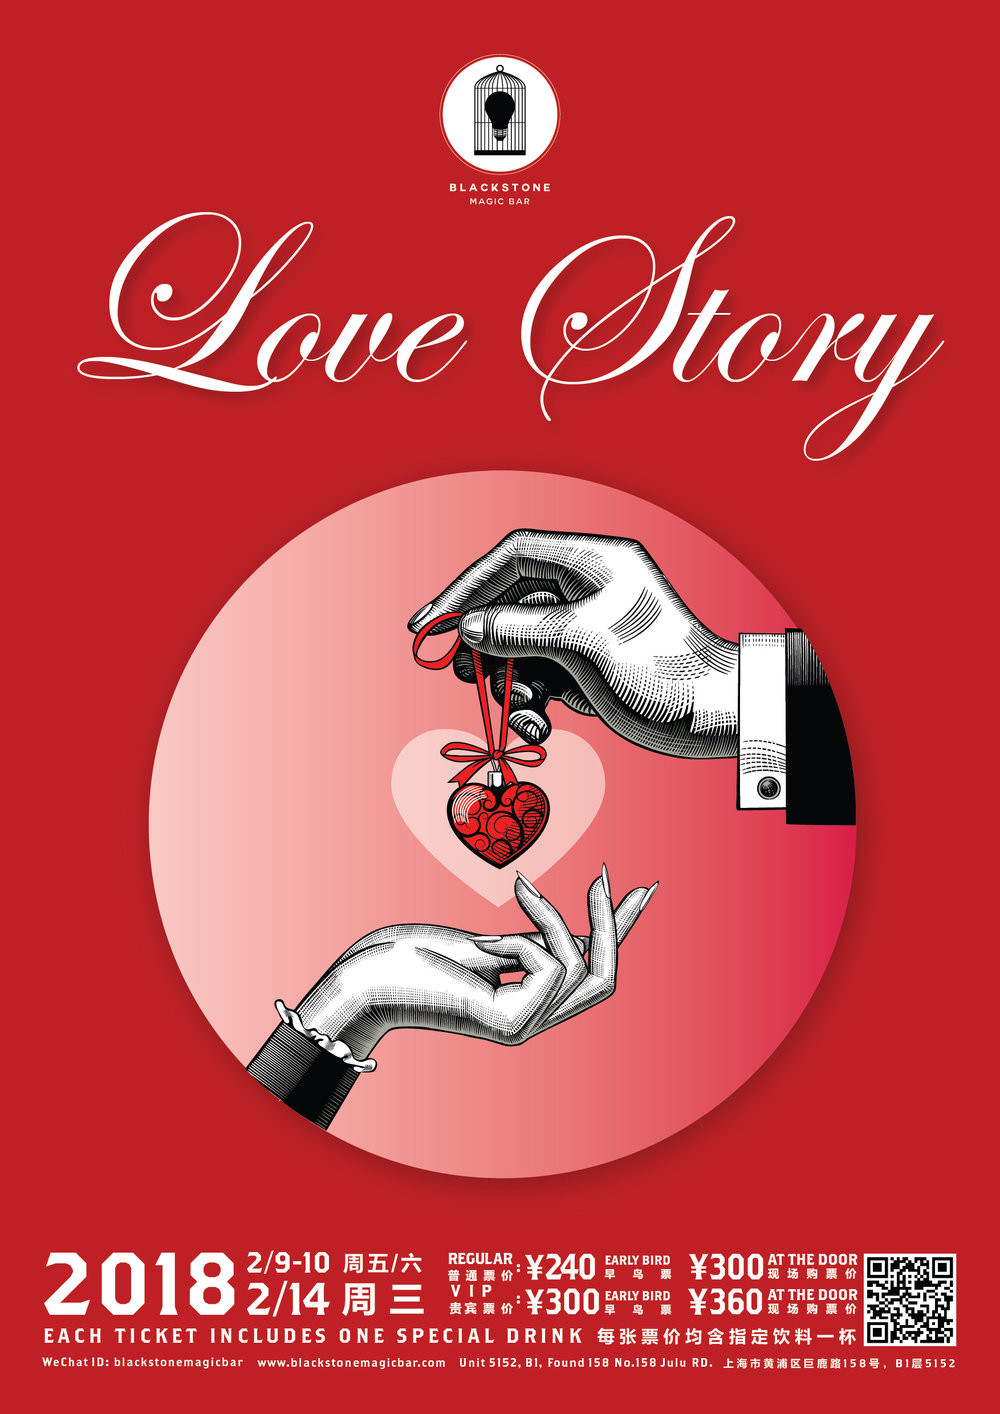 BLACKSTONE LIVE - 情人节特别演出《LOVE STORY》